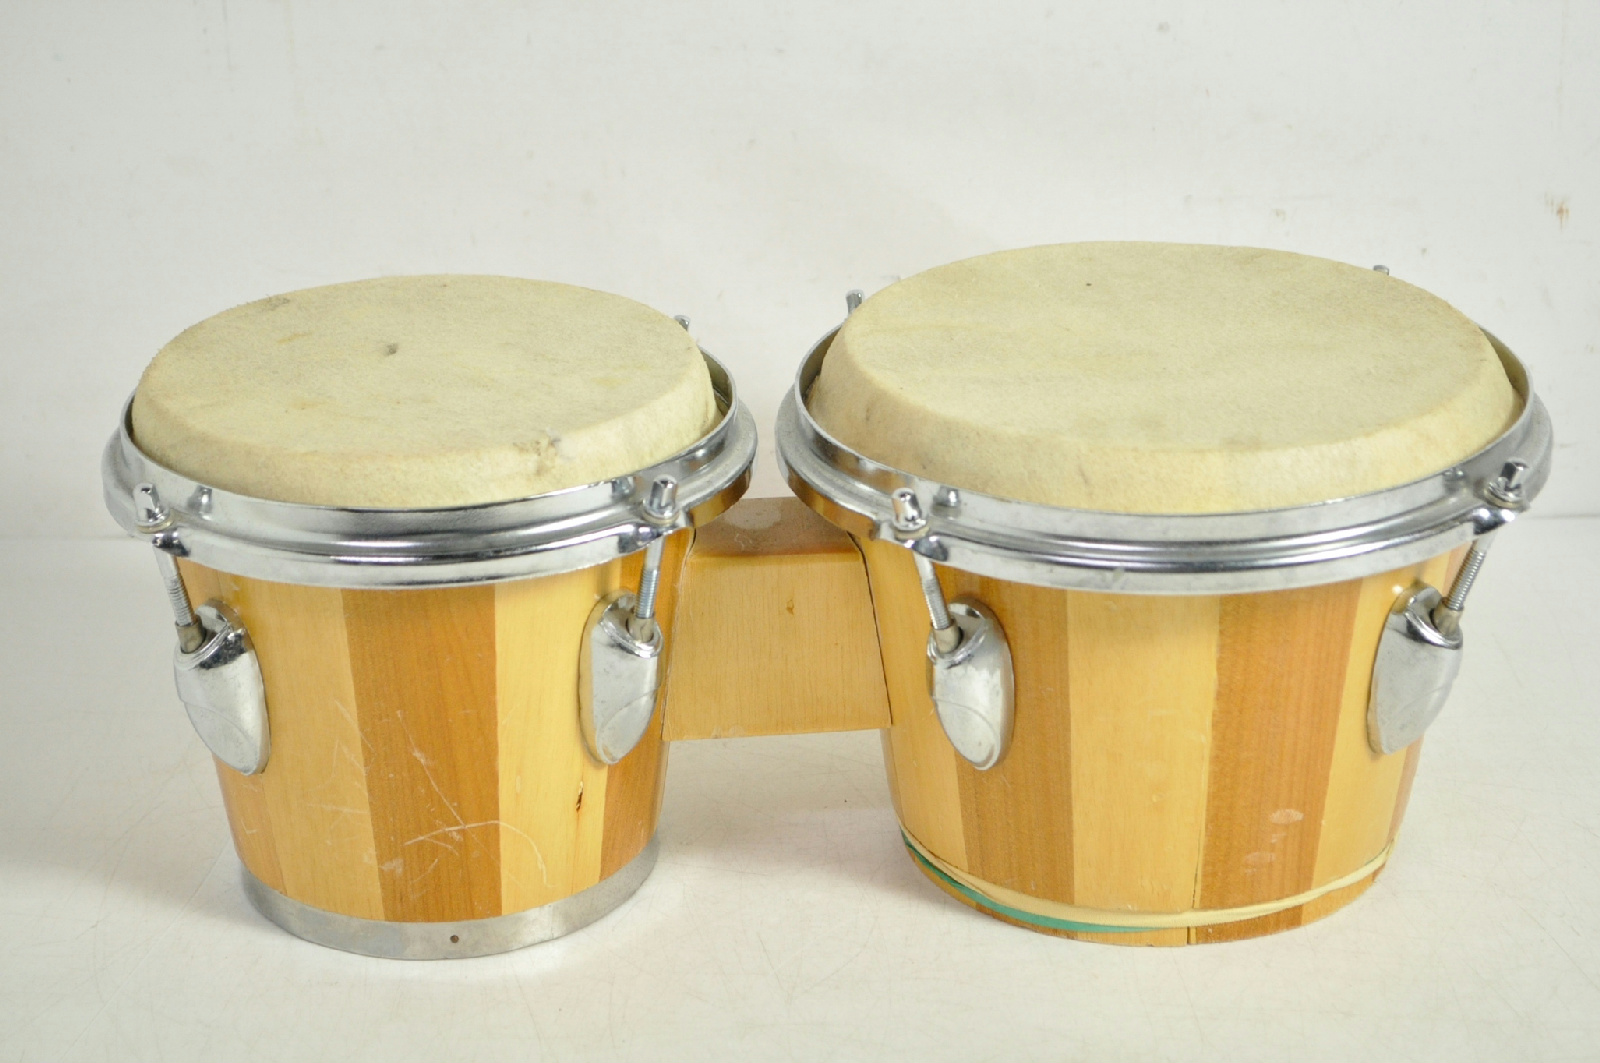 Wooden percussion bongo